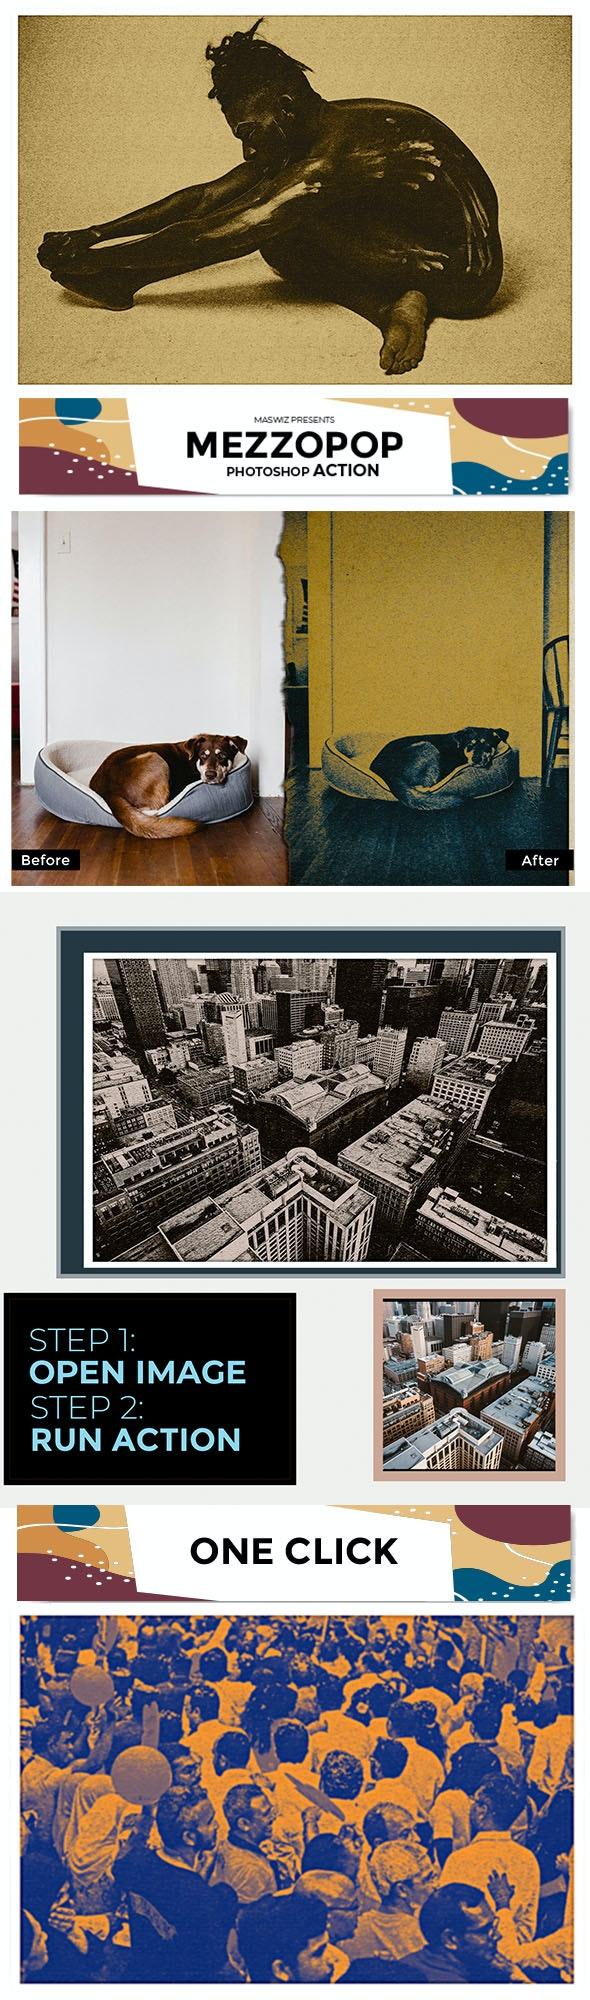 Maswiz Mezzopop Photo Action - Photo Effects Actions